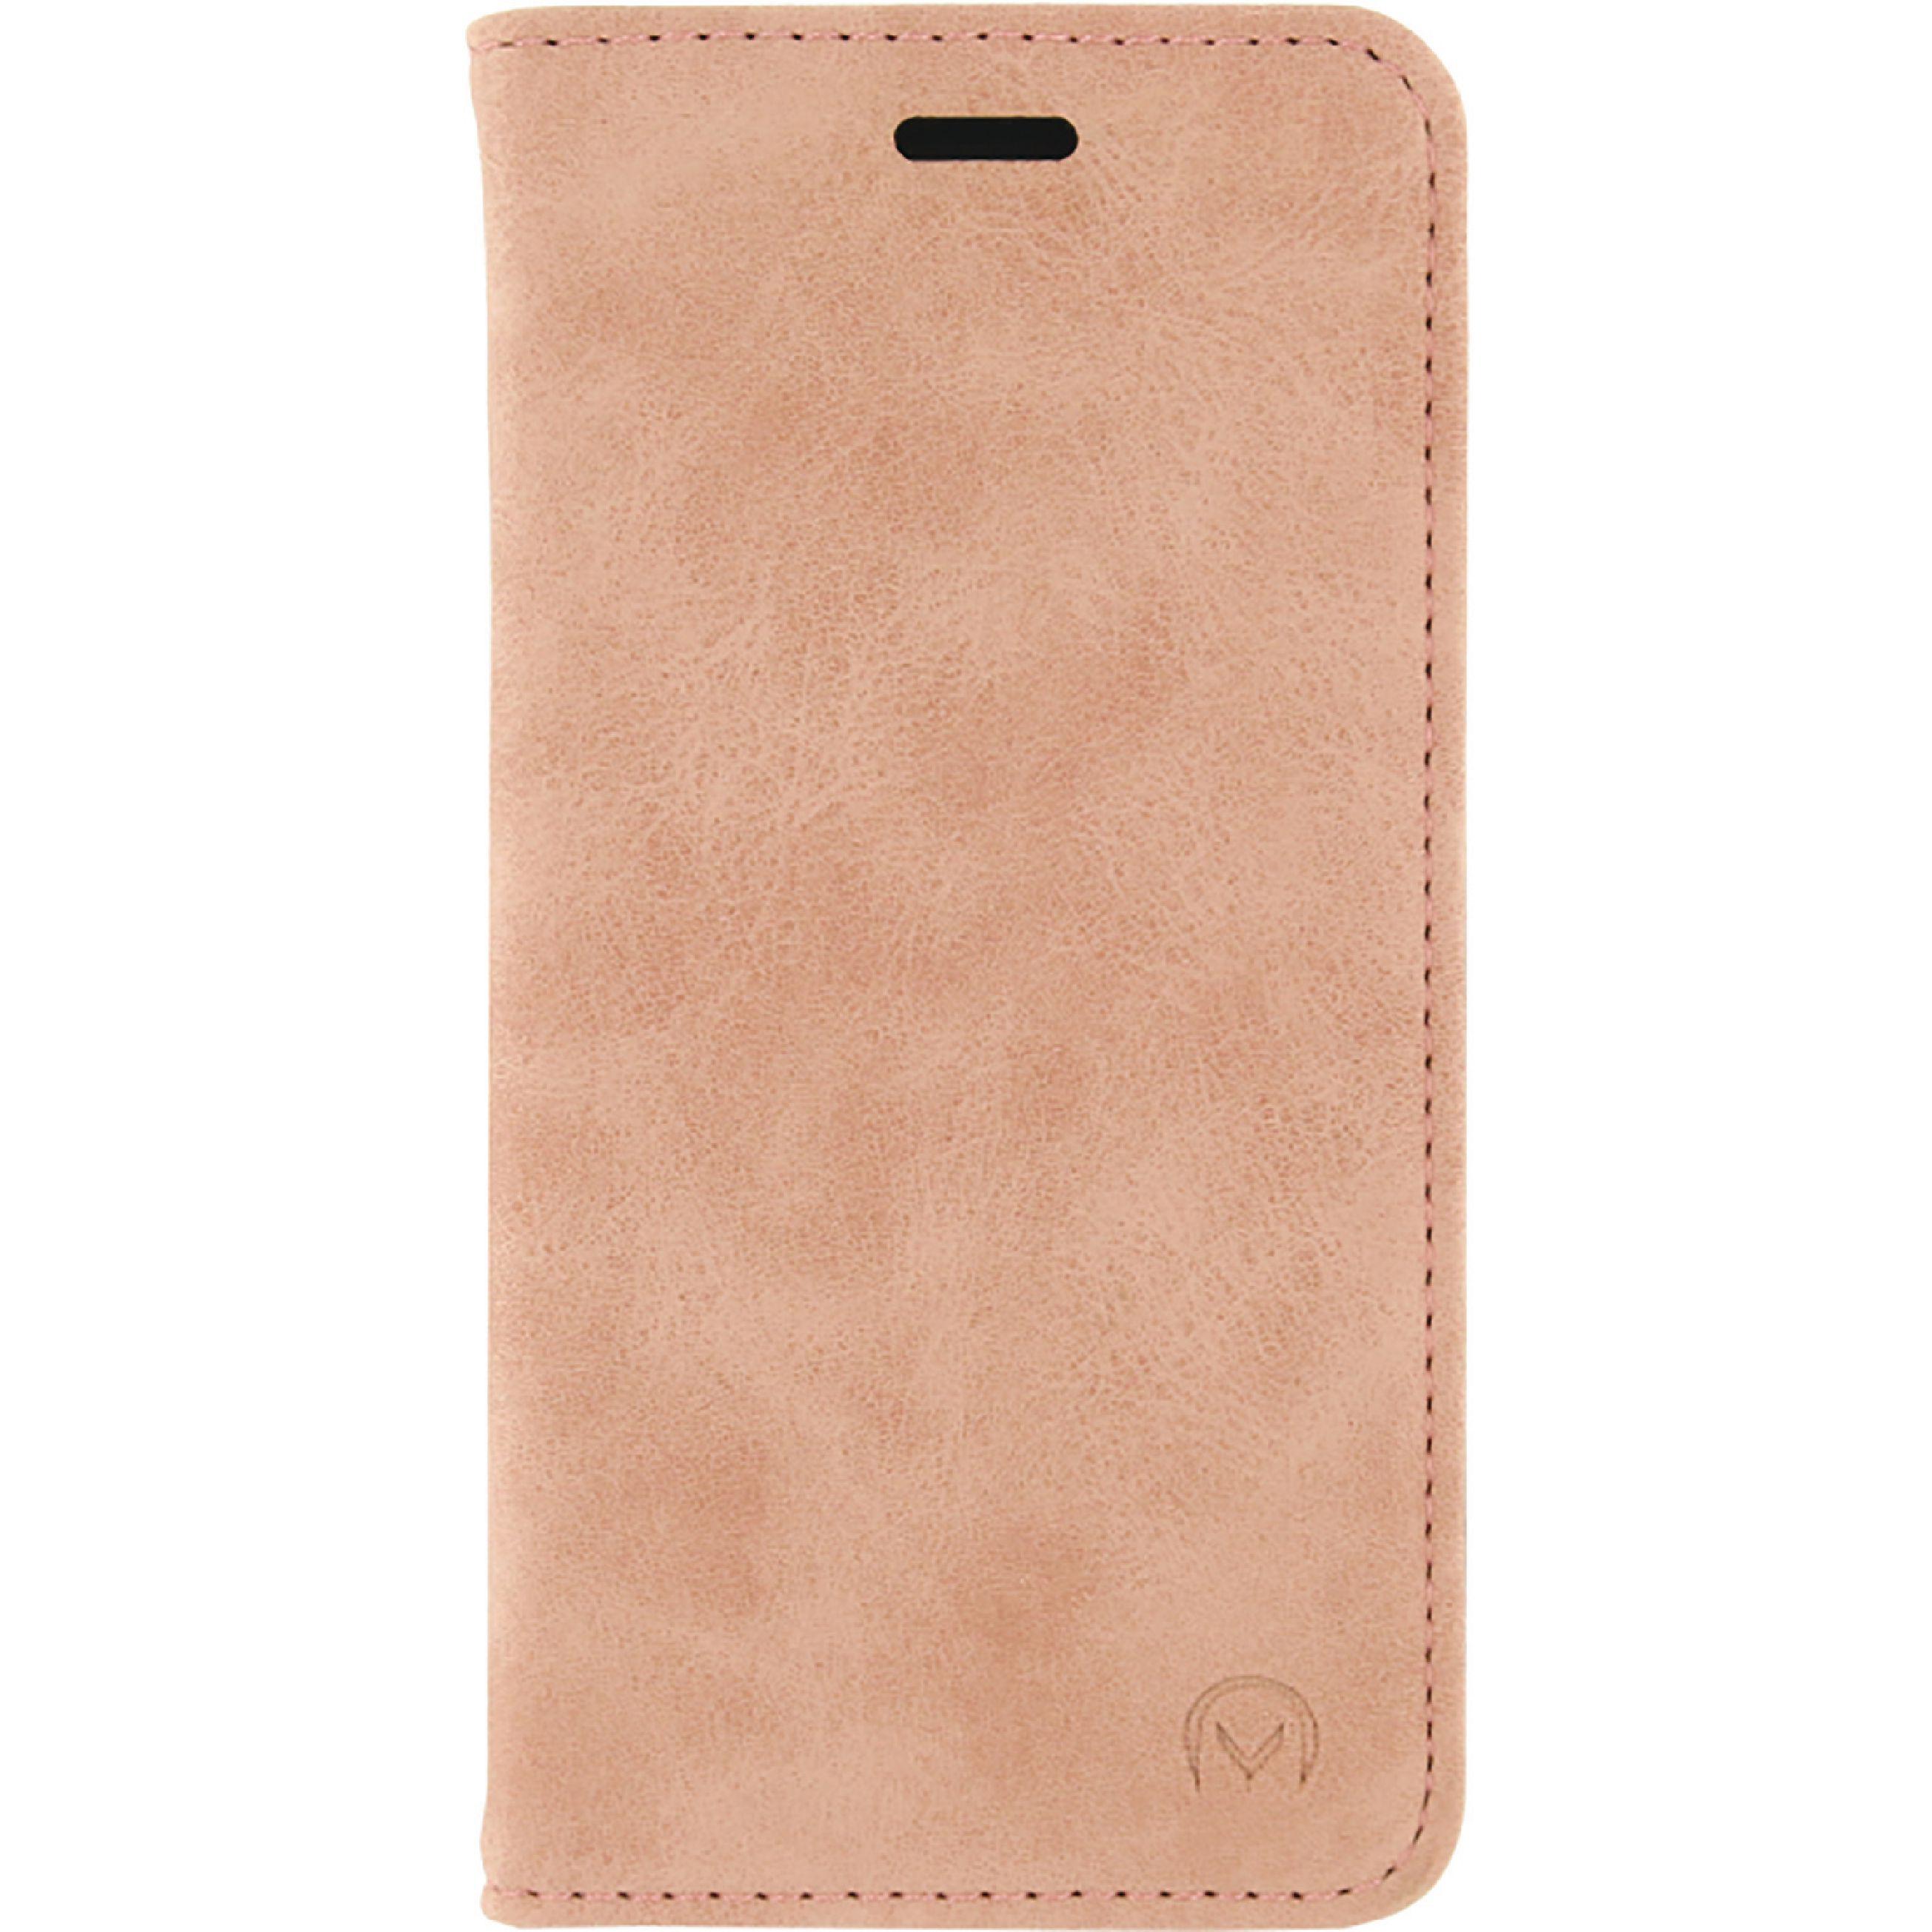 Image of   Telefon Premium Blødt Bogetui Samsung Galaxy A3 2016 Pink